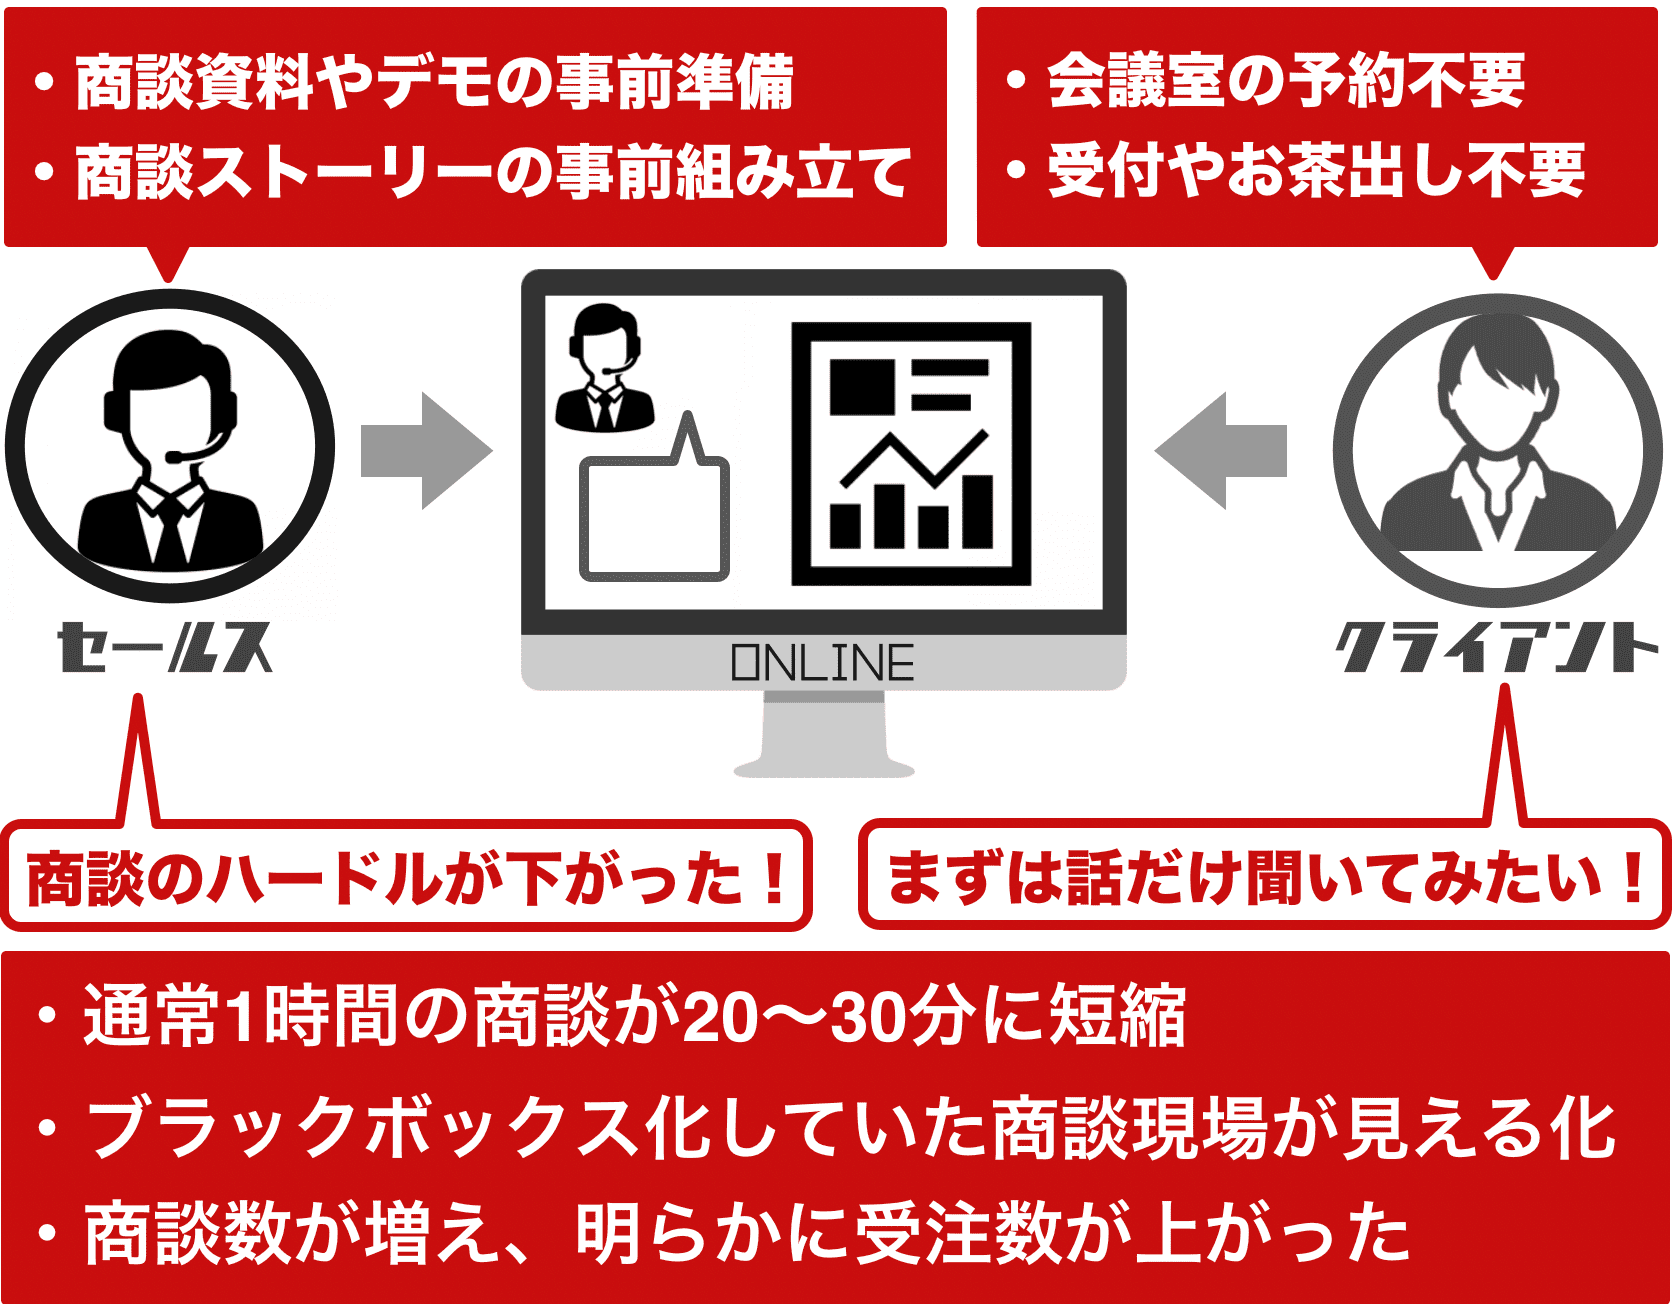 hajimari オンライン商談